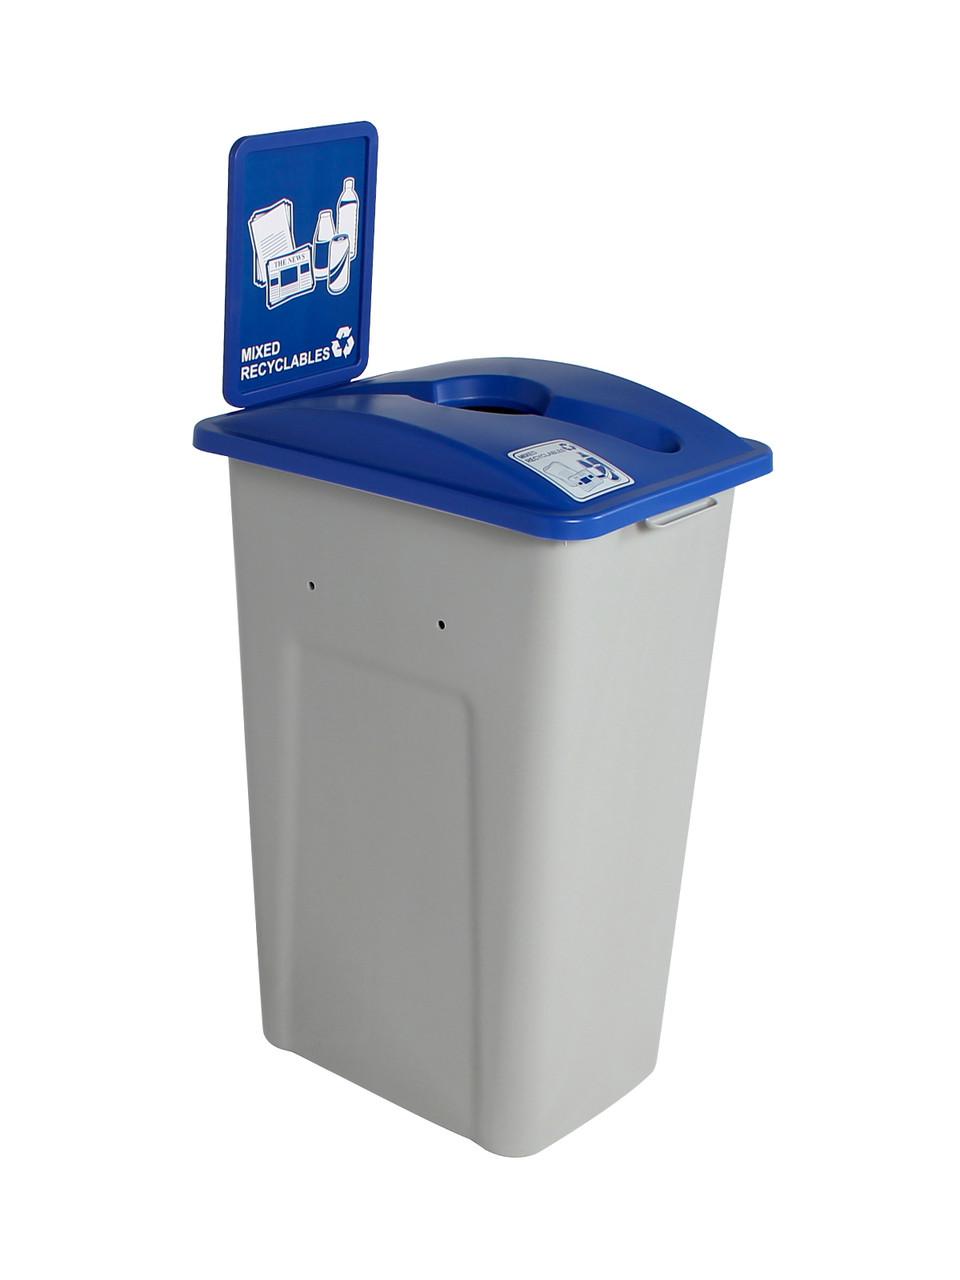 32 Gal. Plastic XL Simple Sort Single Indoor Recycling Bin